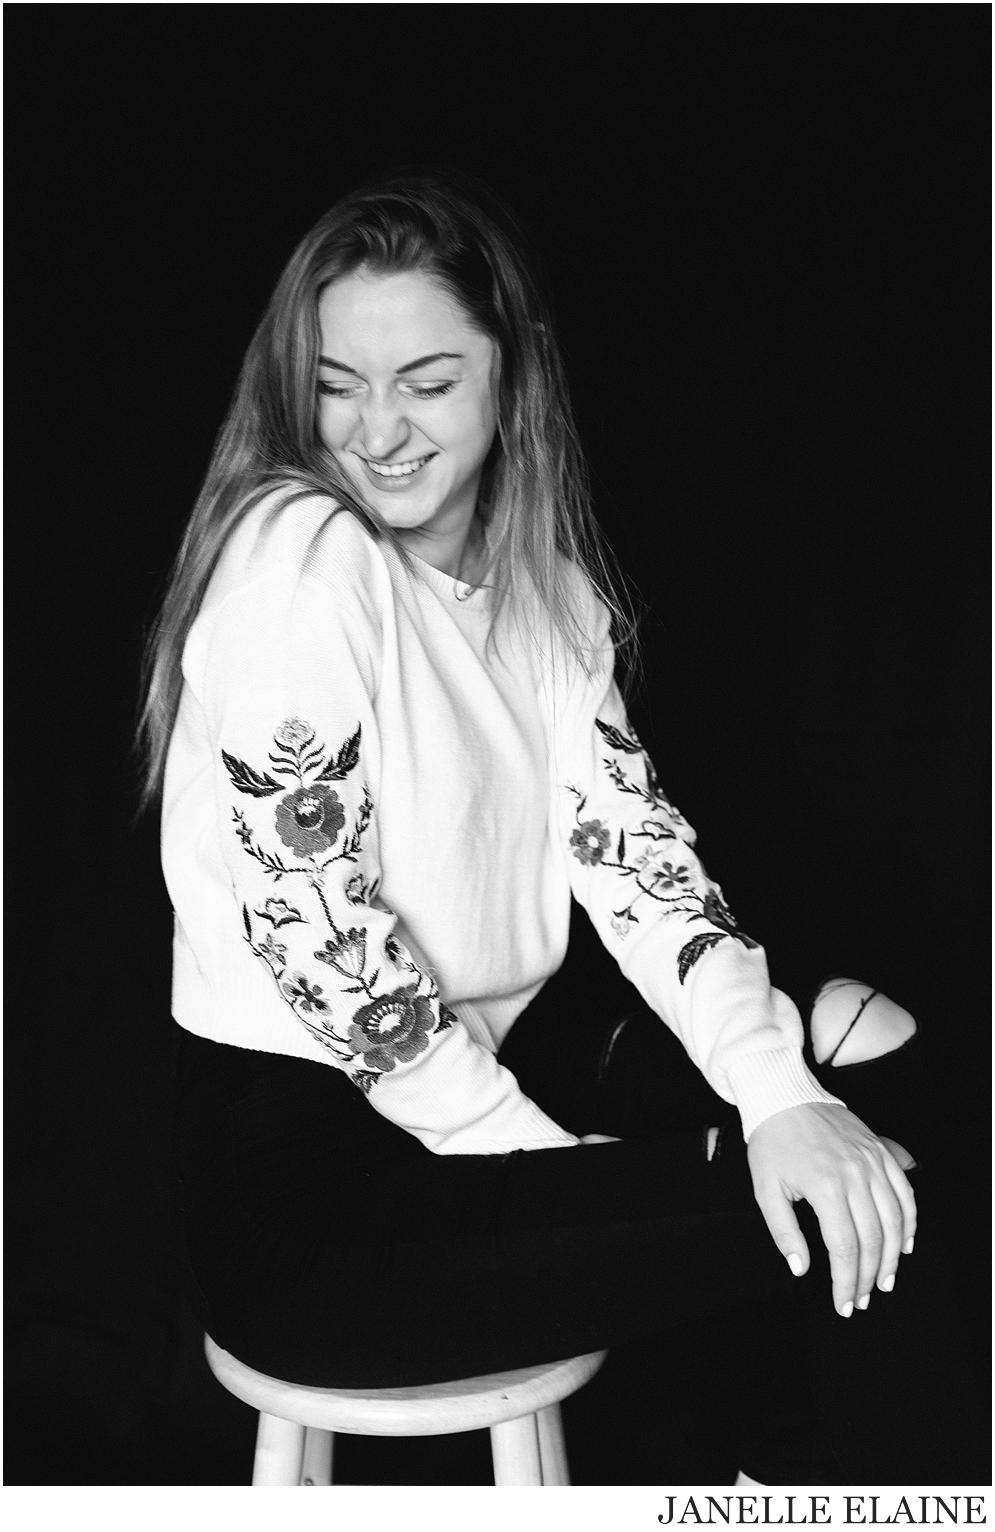 kirsi-seattle-wa-portrait photography-janelle elaine photography-38.jpg